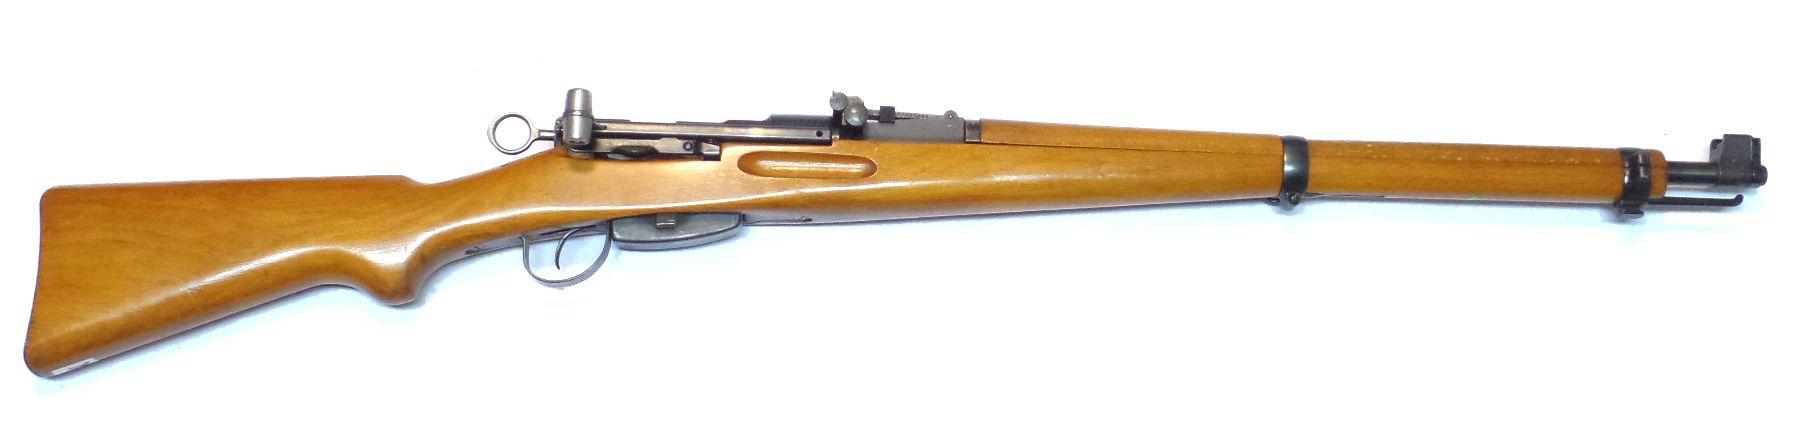 Schmidt Rubin - K31 calibre 22LR